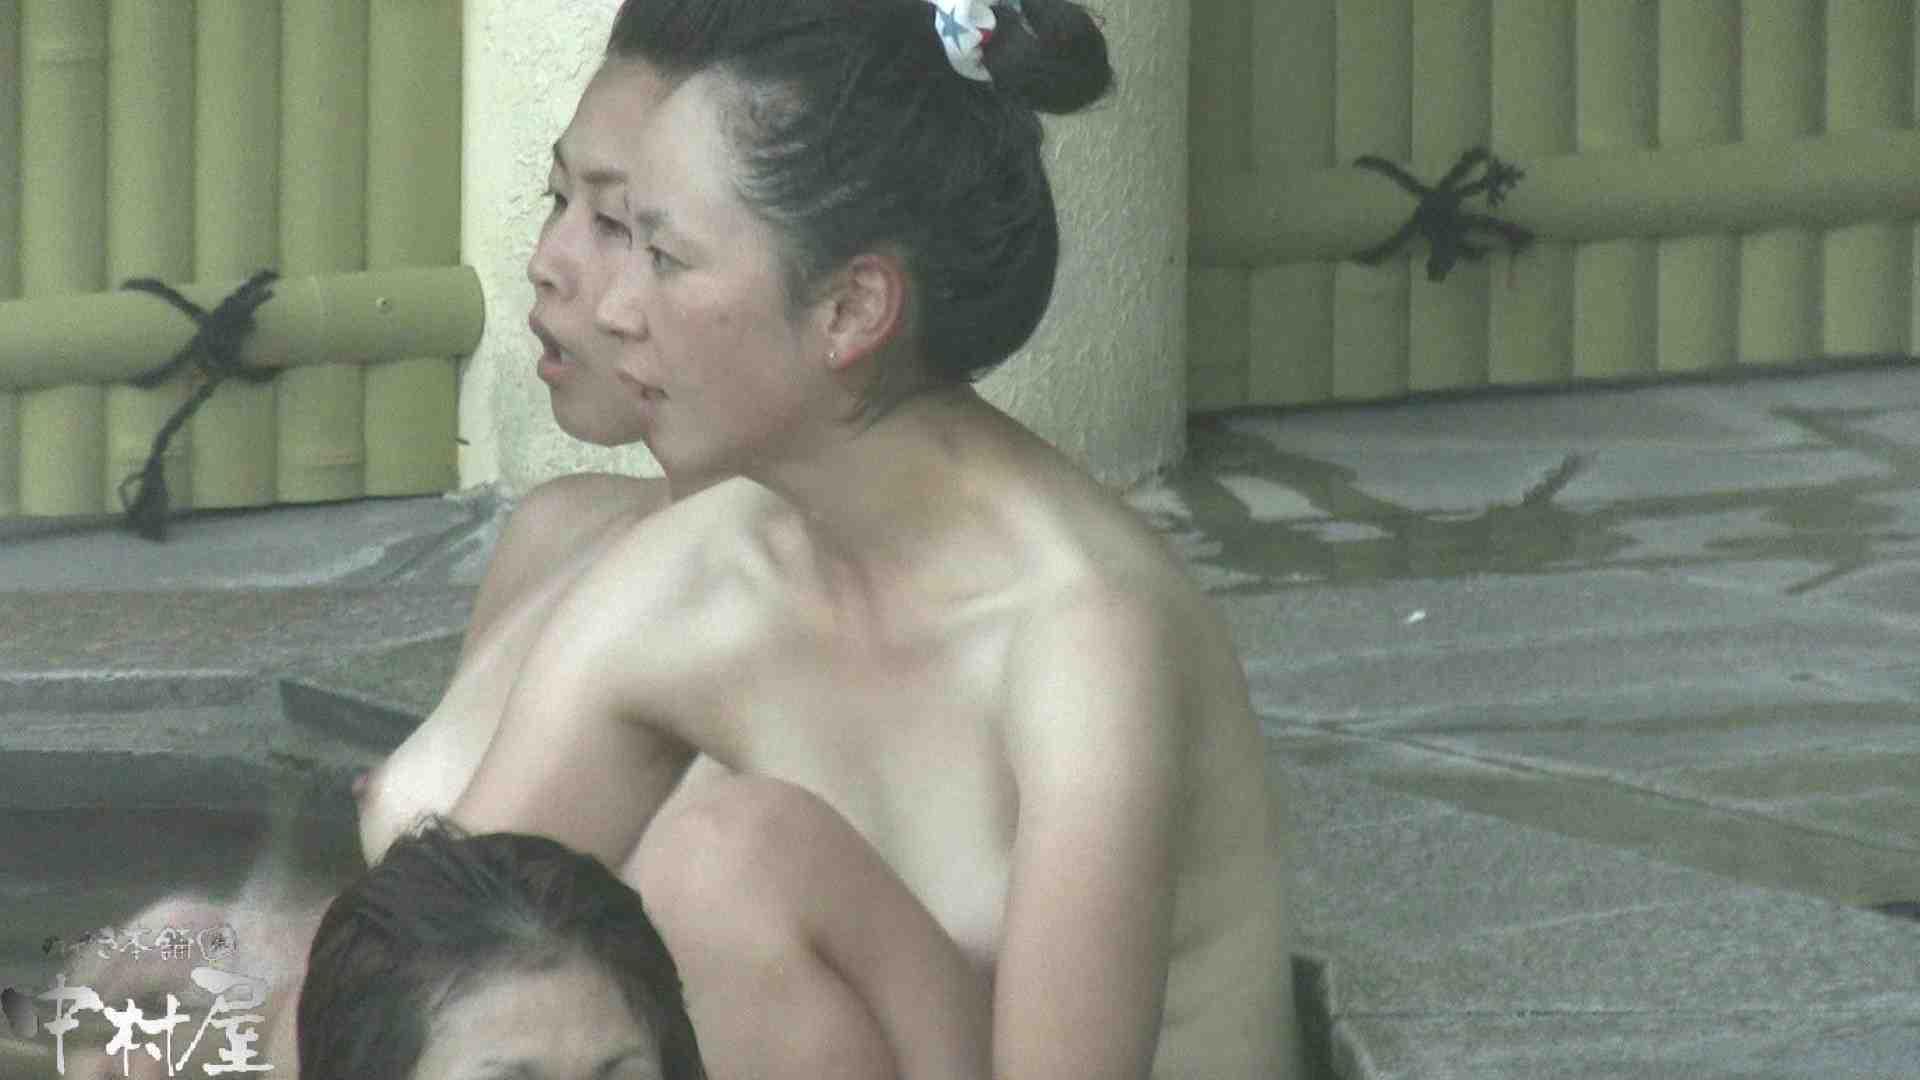 Aquaな露天風呂Vol.911 0  88連発 8